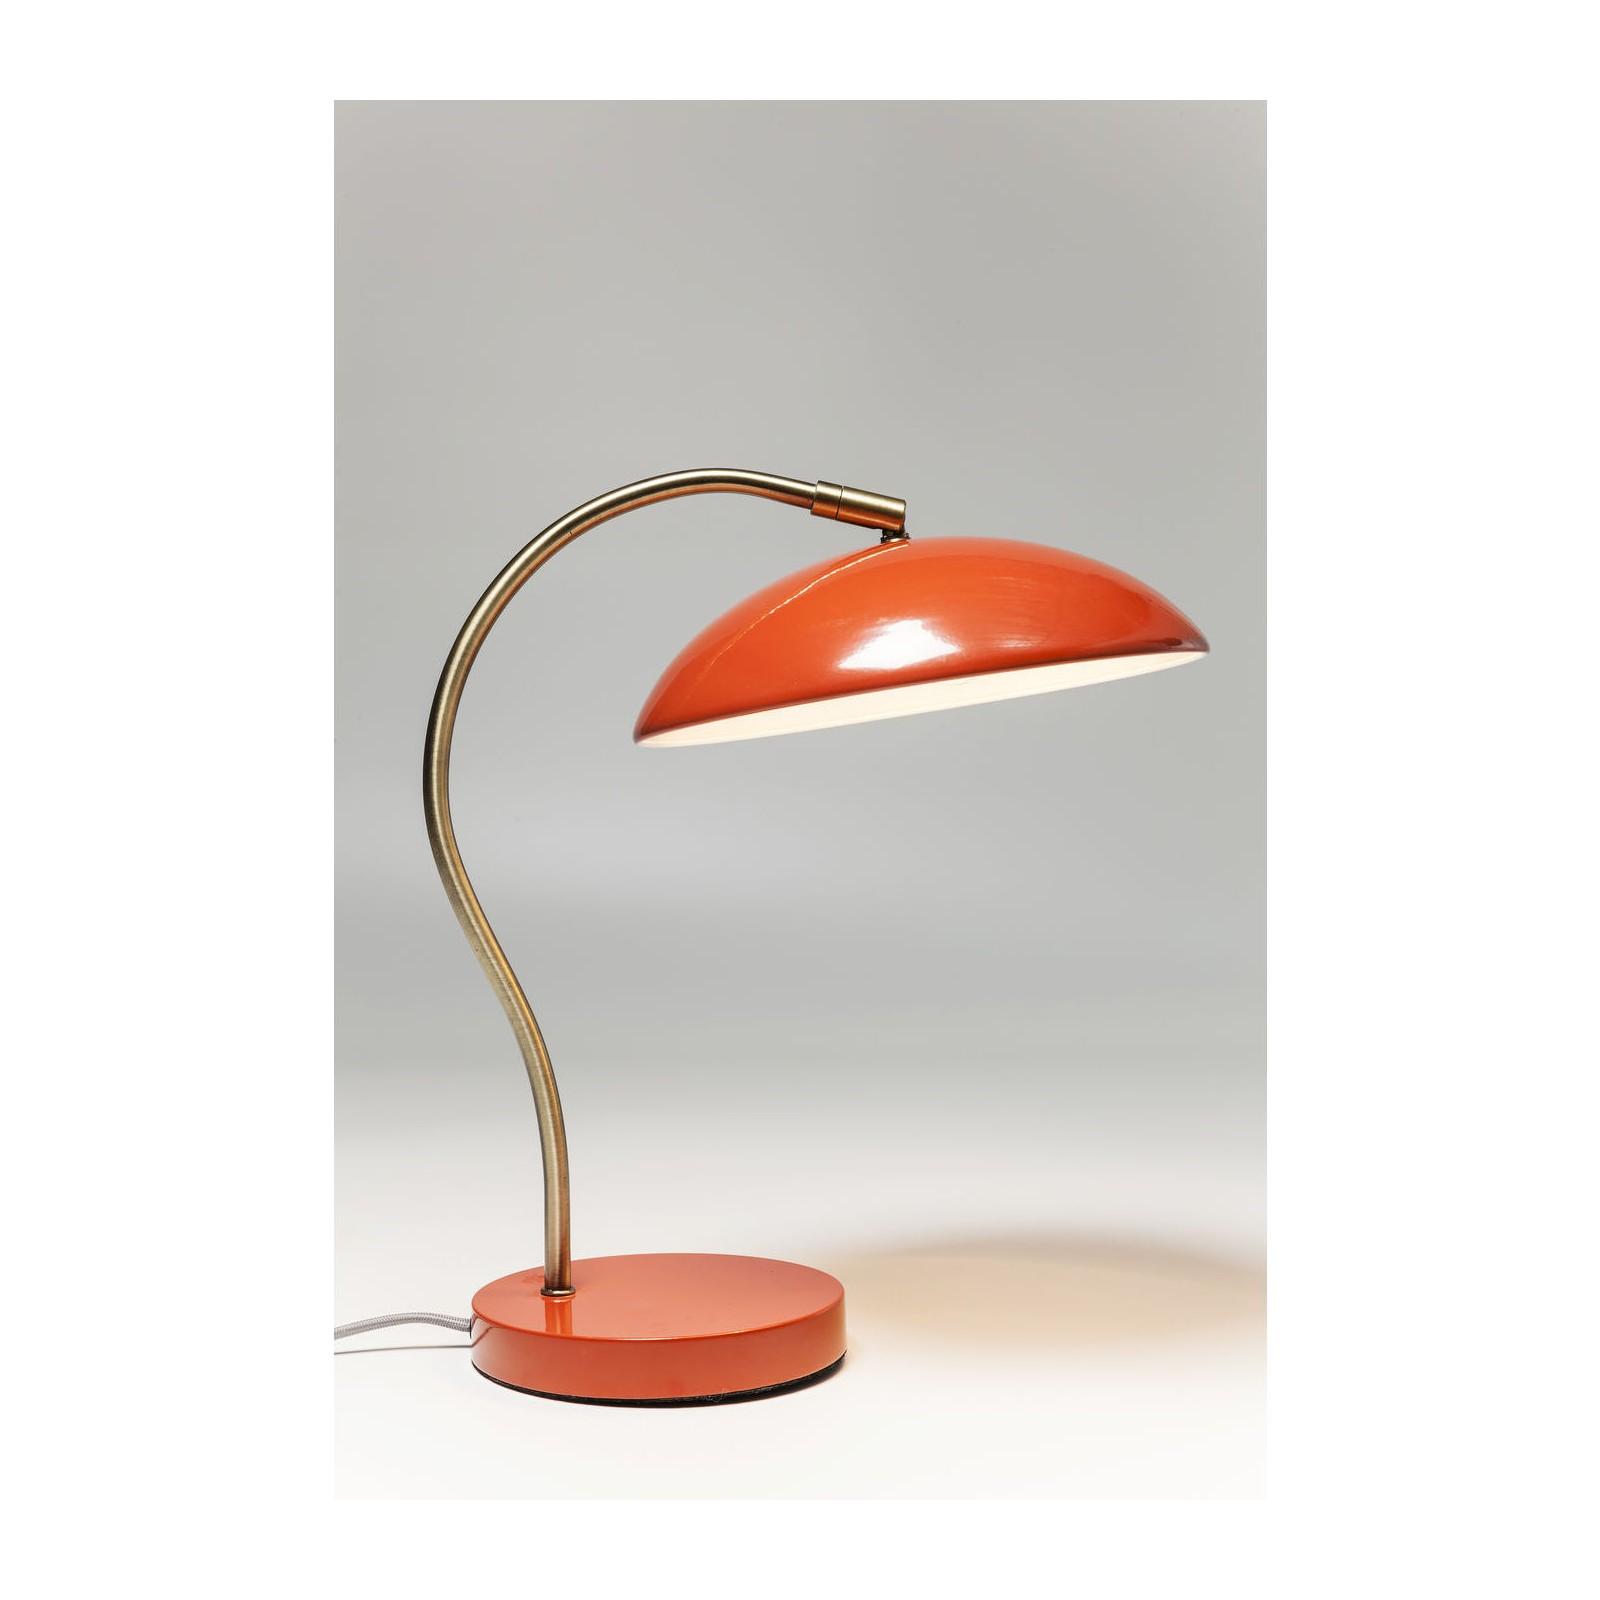 LAMPE DE TABLE UFO ORANGE KARE DESIGN